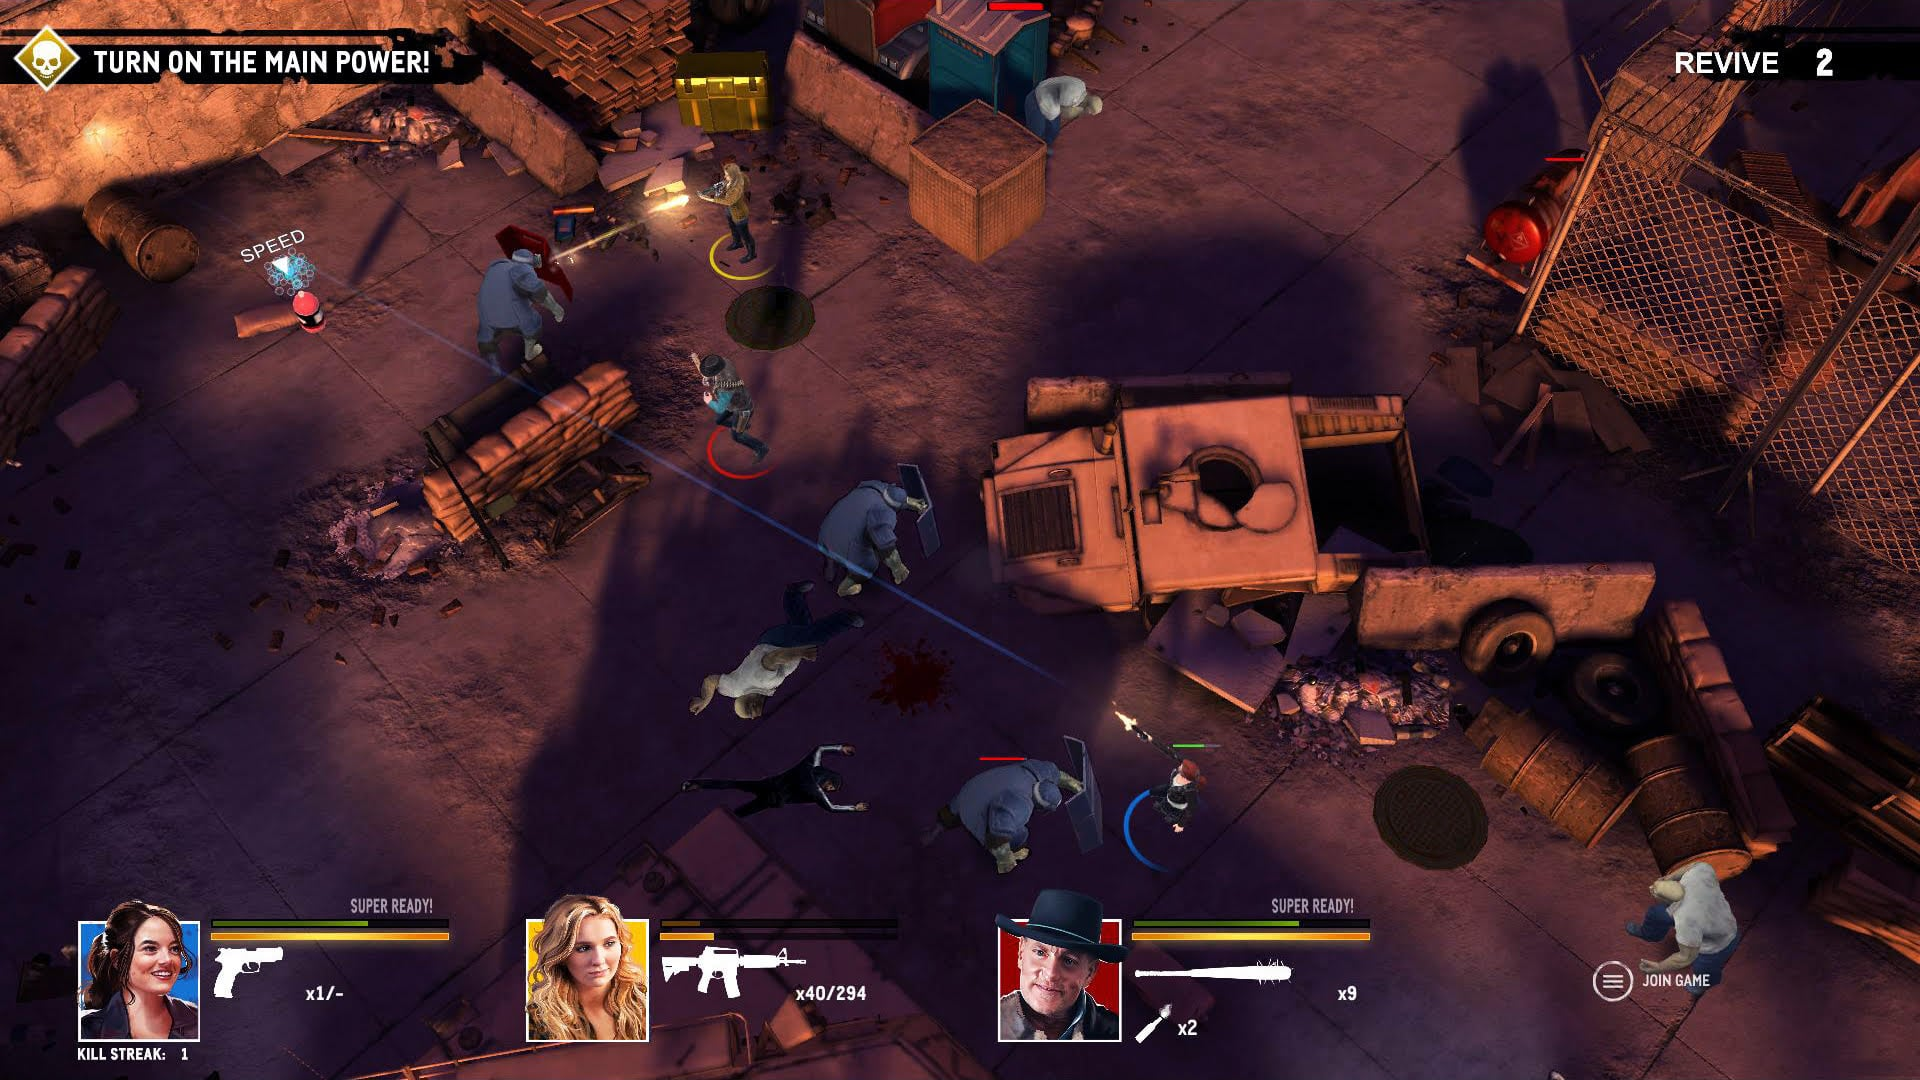 Zombieland: Double Tap - Road Trip Screenshot 3